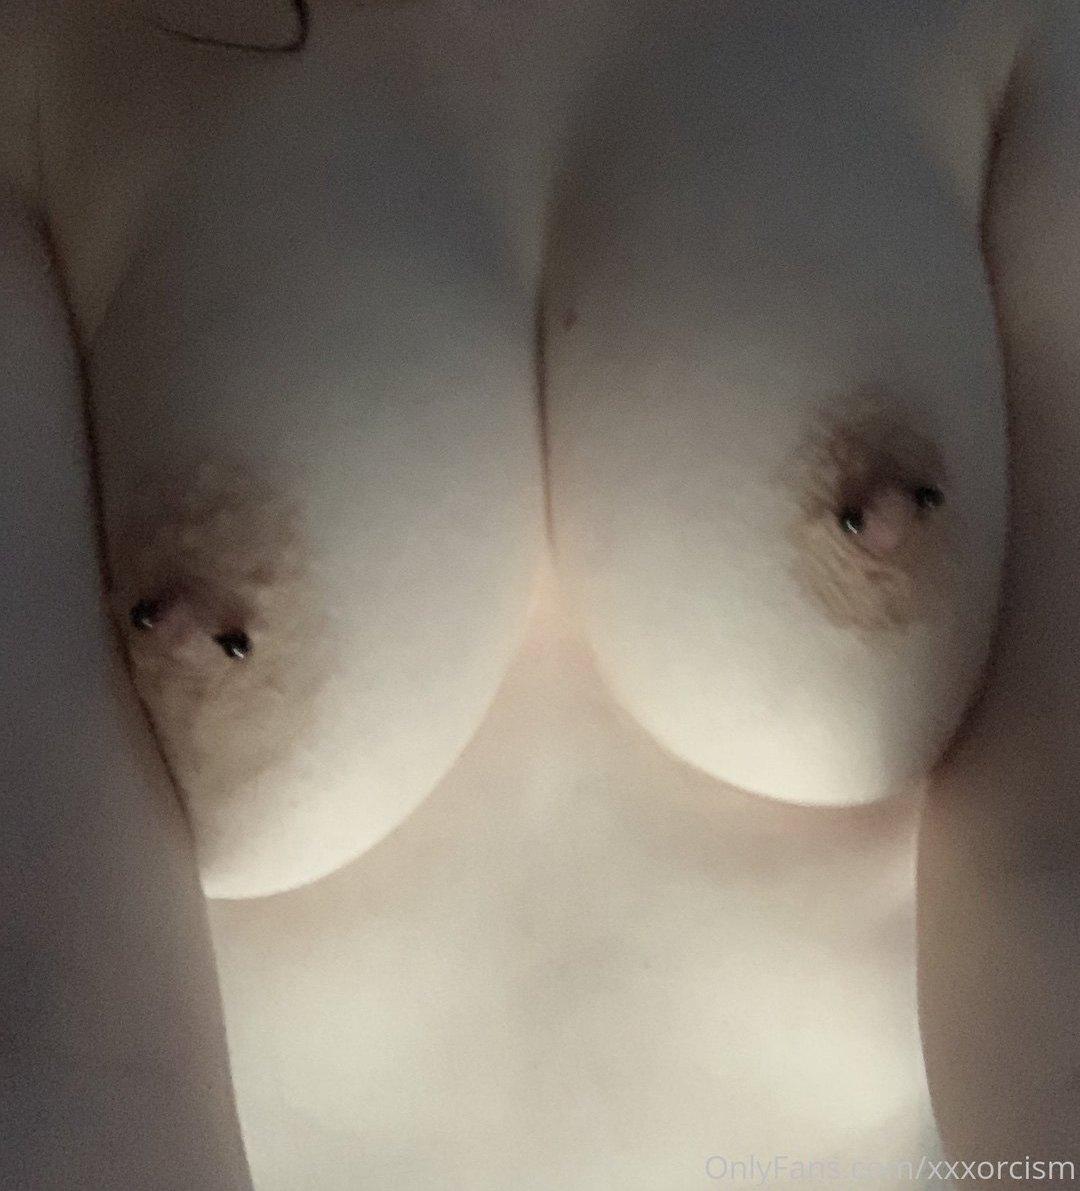 Stacia Grey Xxxorcism Onlyfans Nudes Leaks 0021